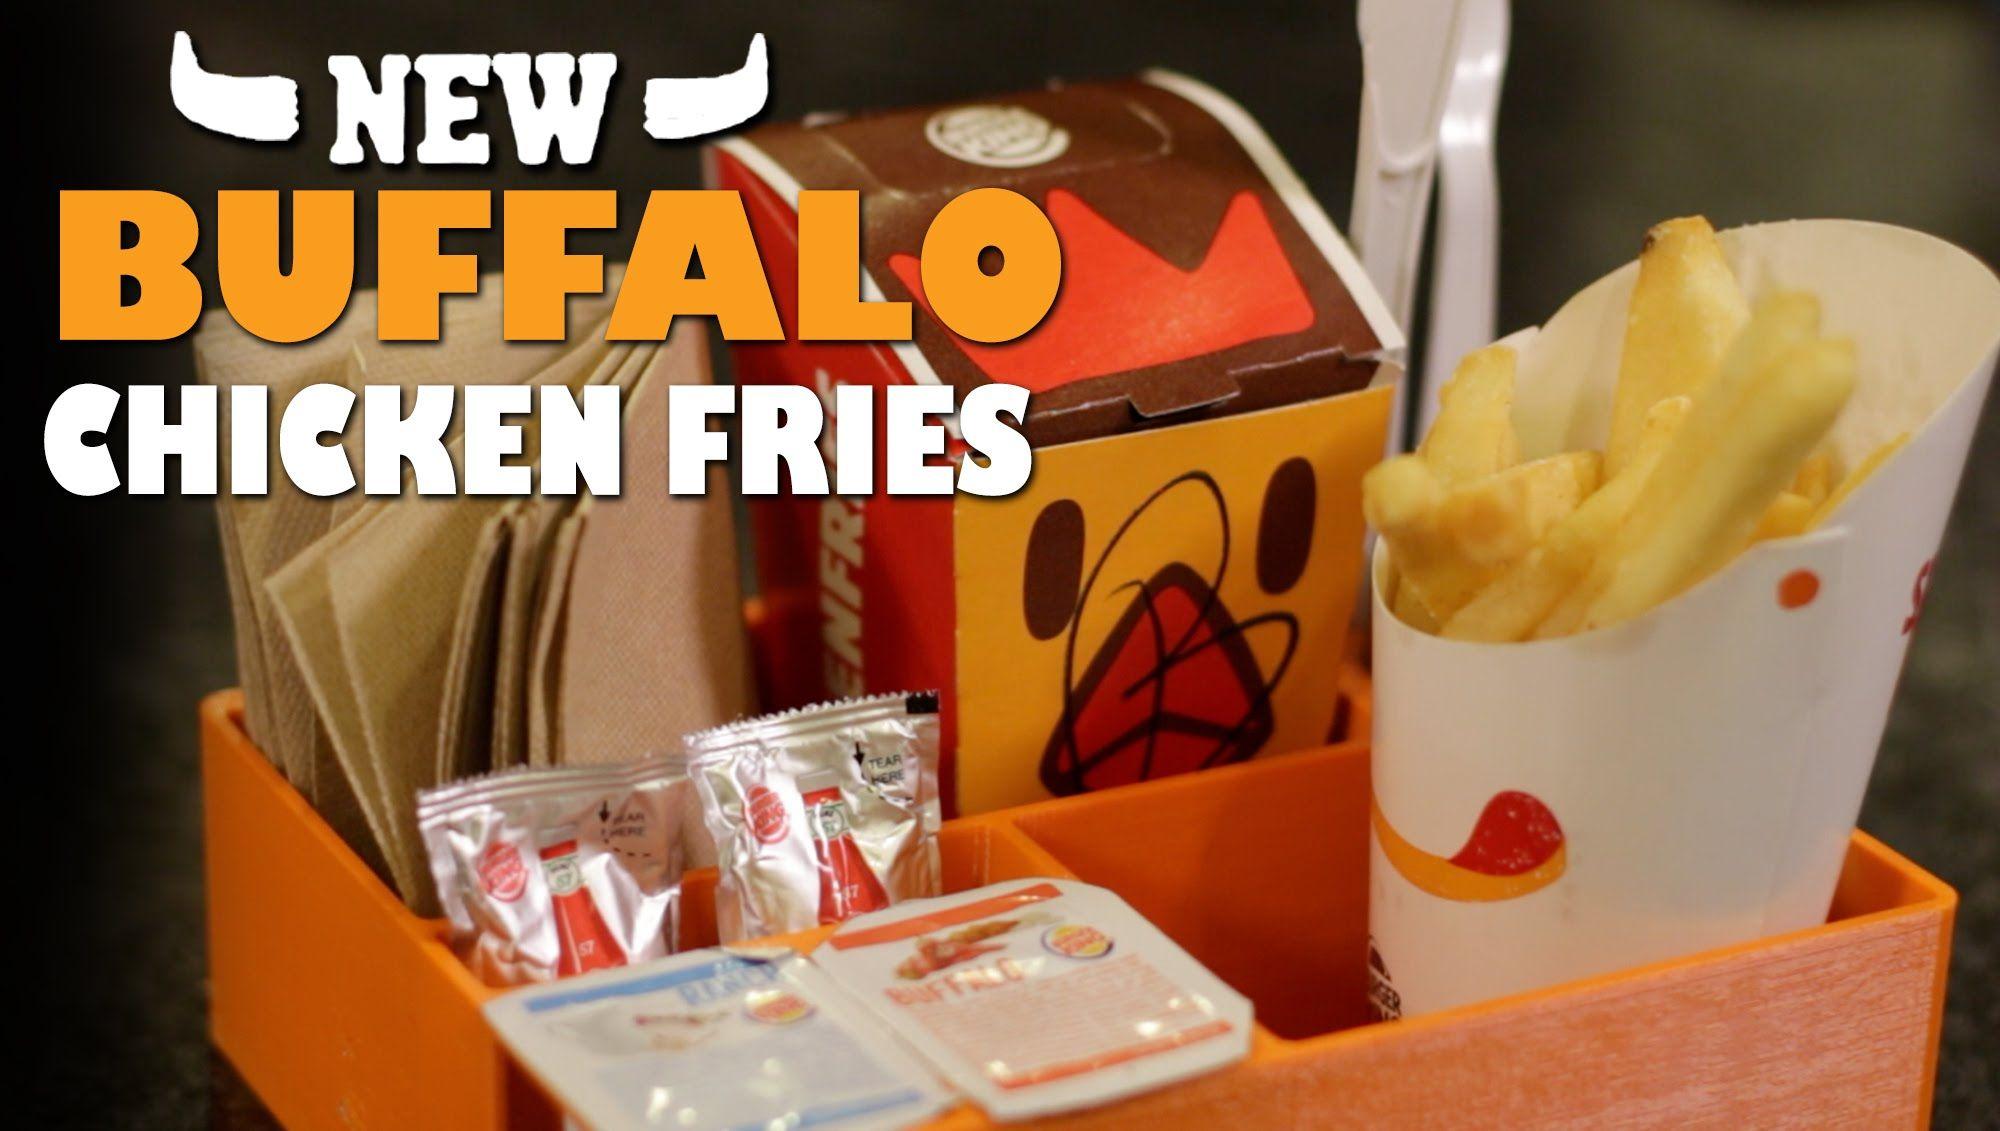 Buffalo chicken fries drive thru caddy review